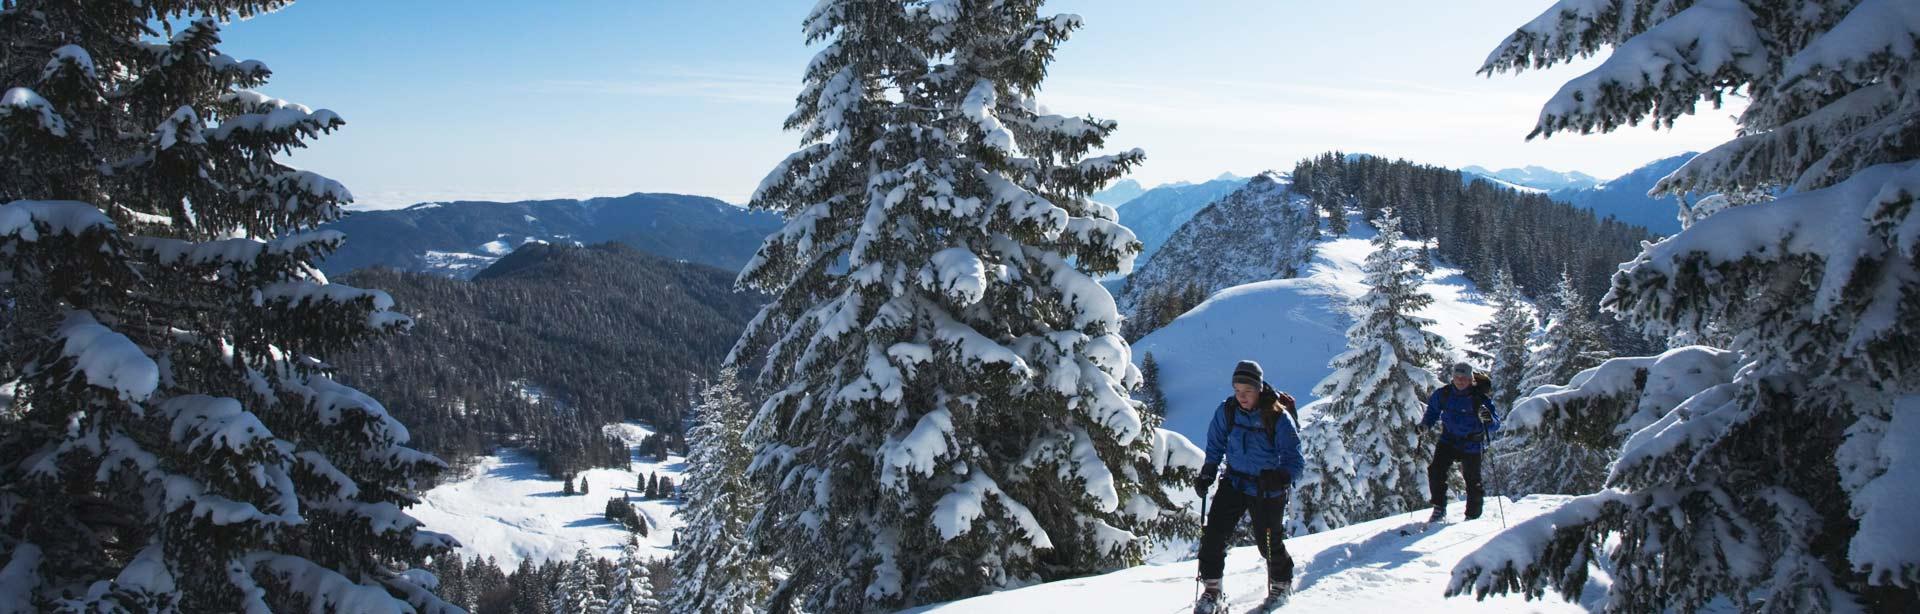 Bild Skitour Hirschberg